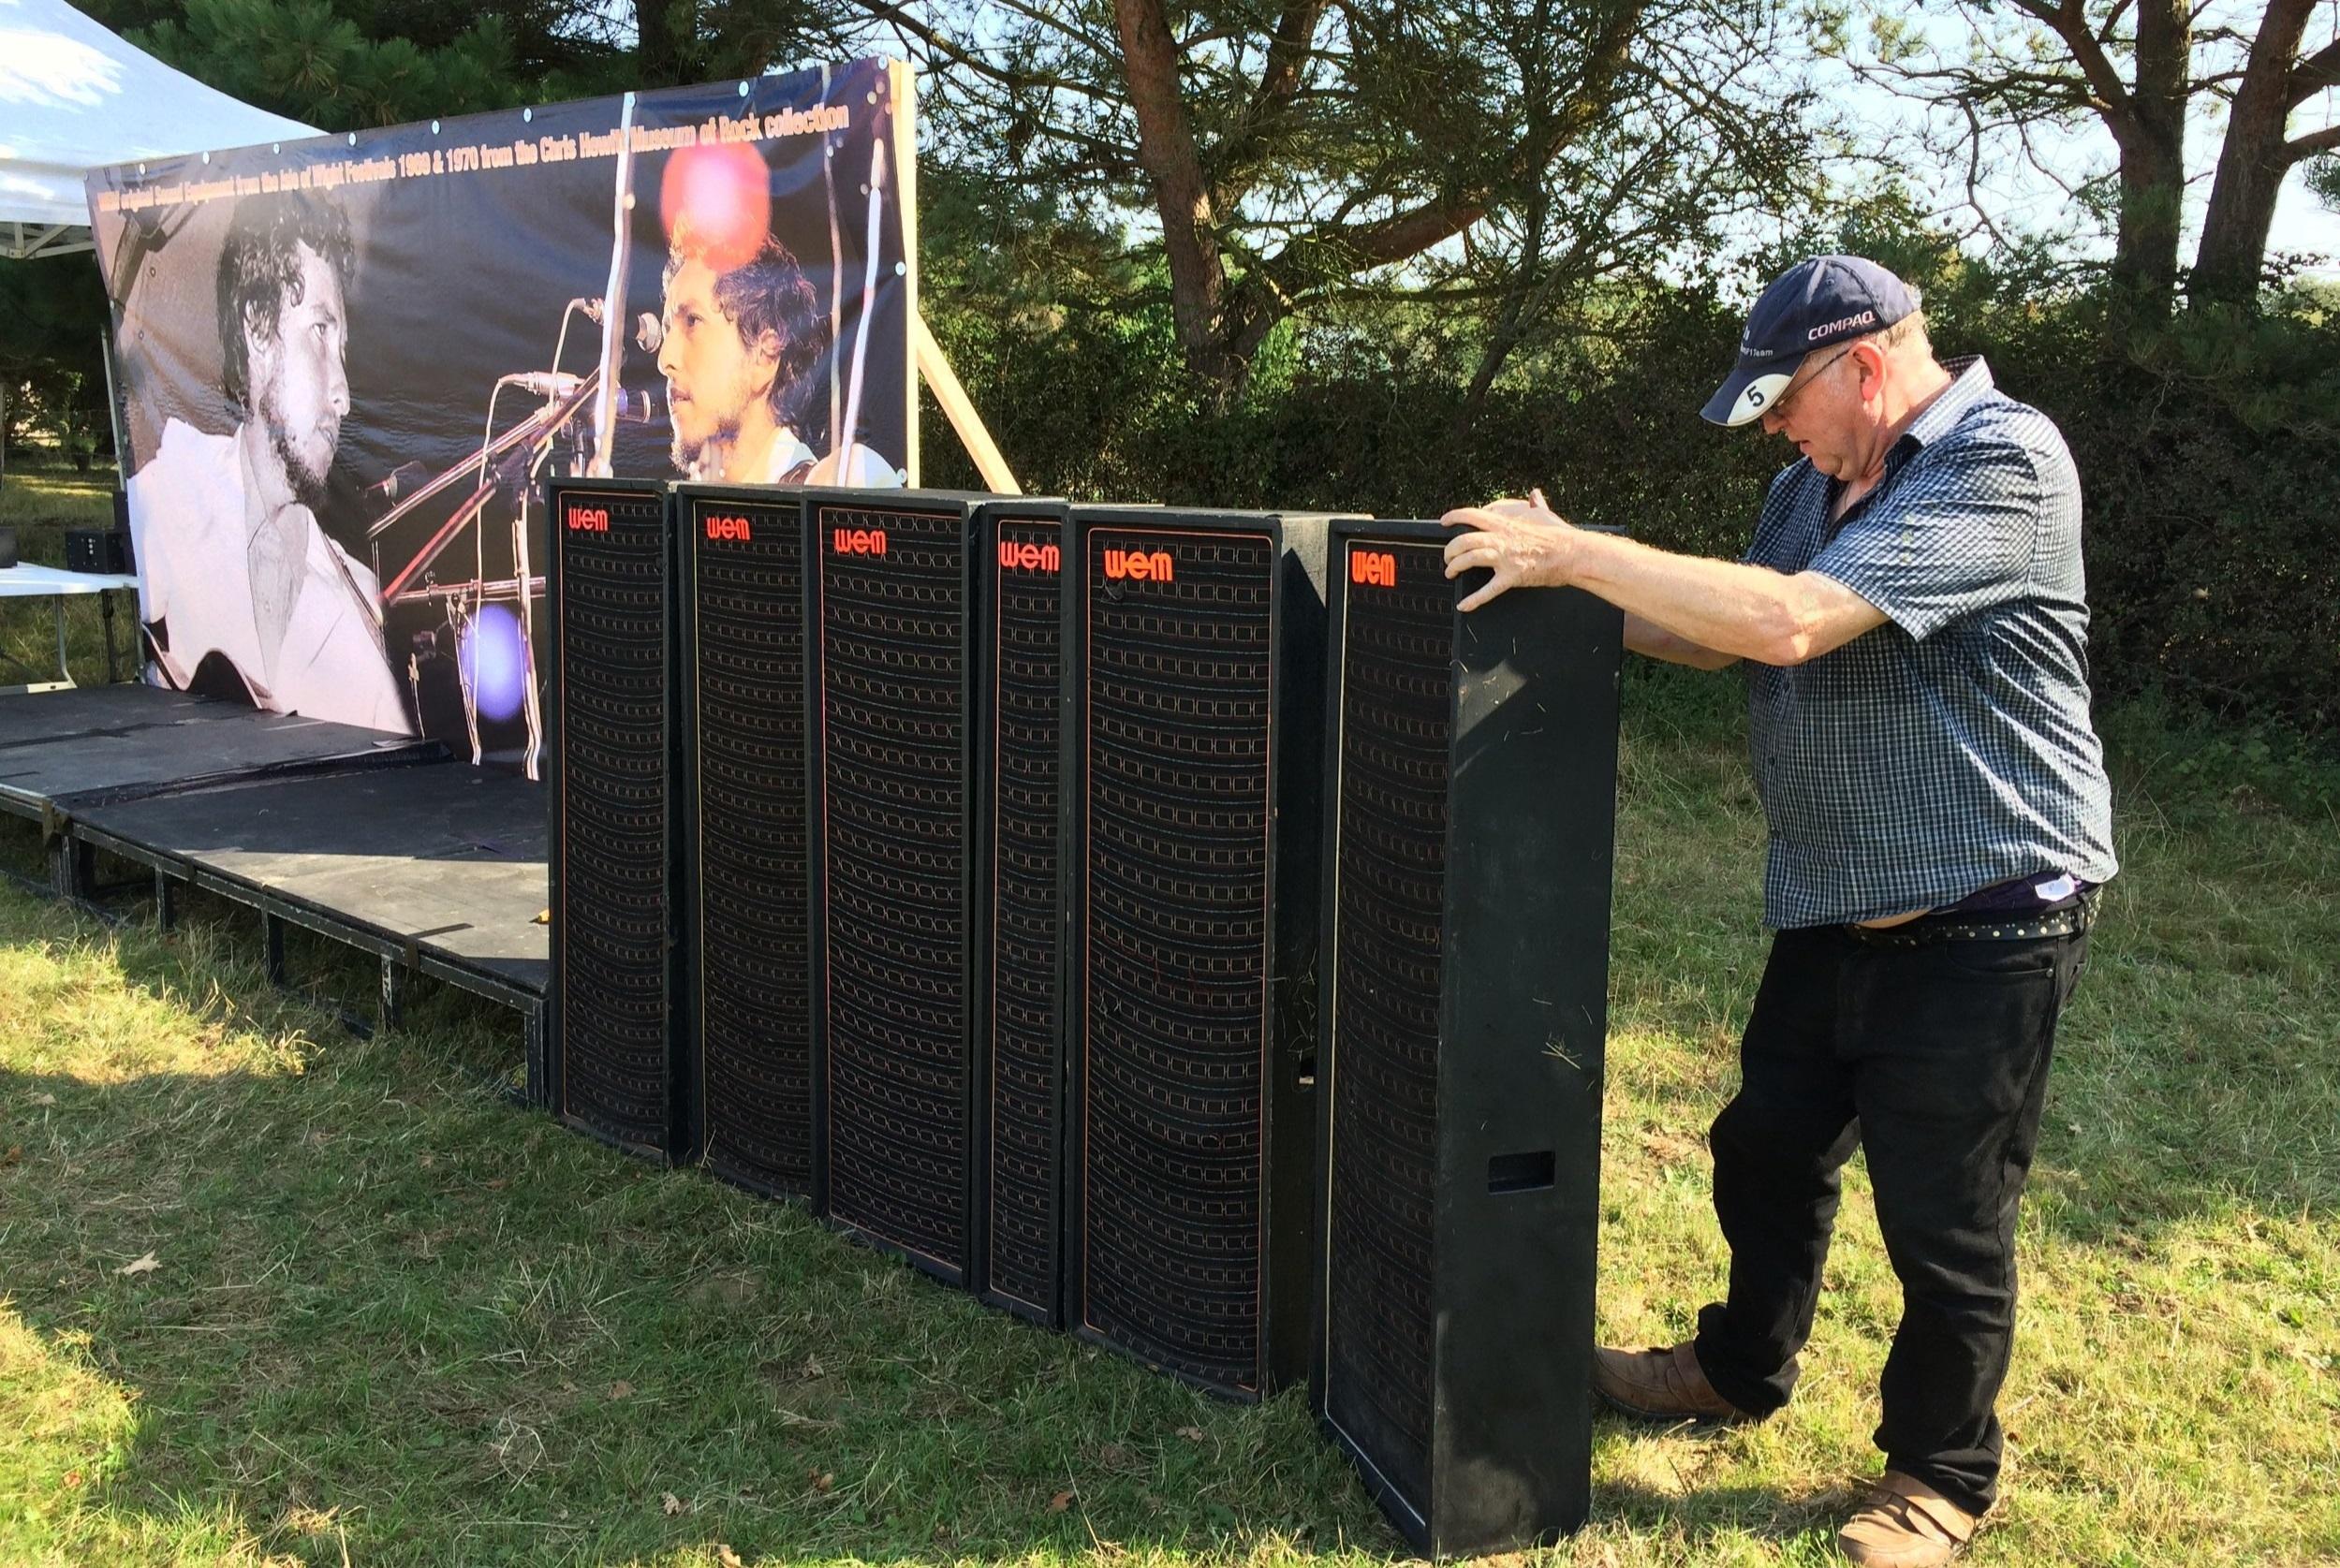 CH Vintage Audio's Chris Hewitt assembles some of his vintage IoW Festival WEM sound gear and impressive Bob Dylan backdrop.